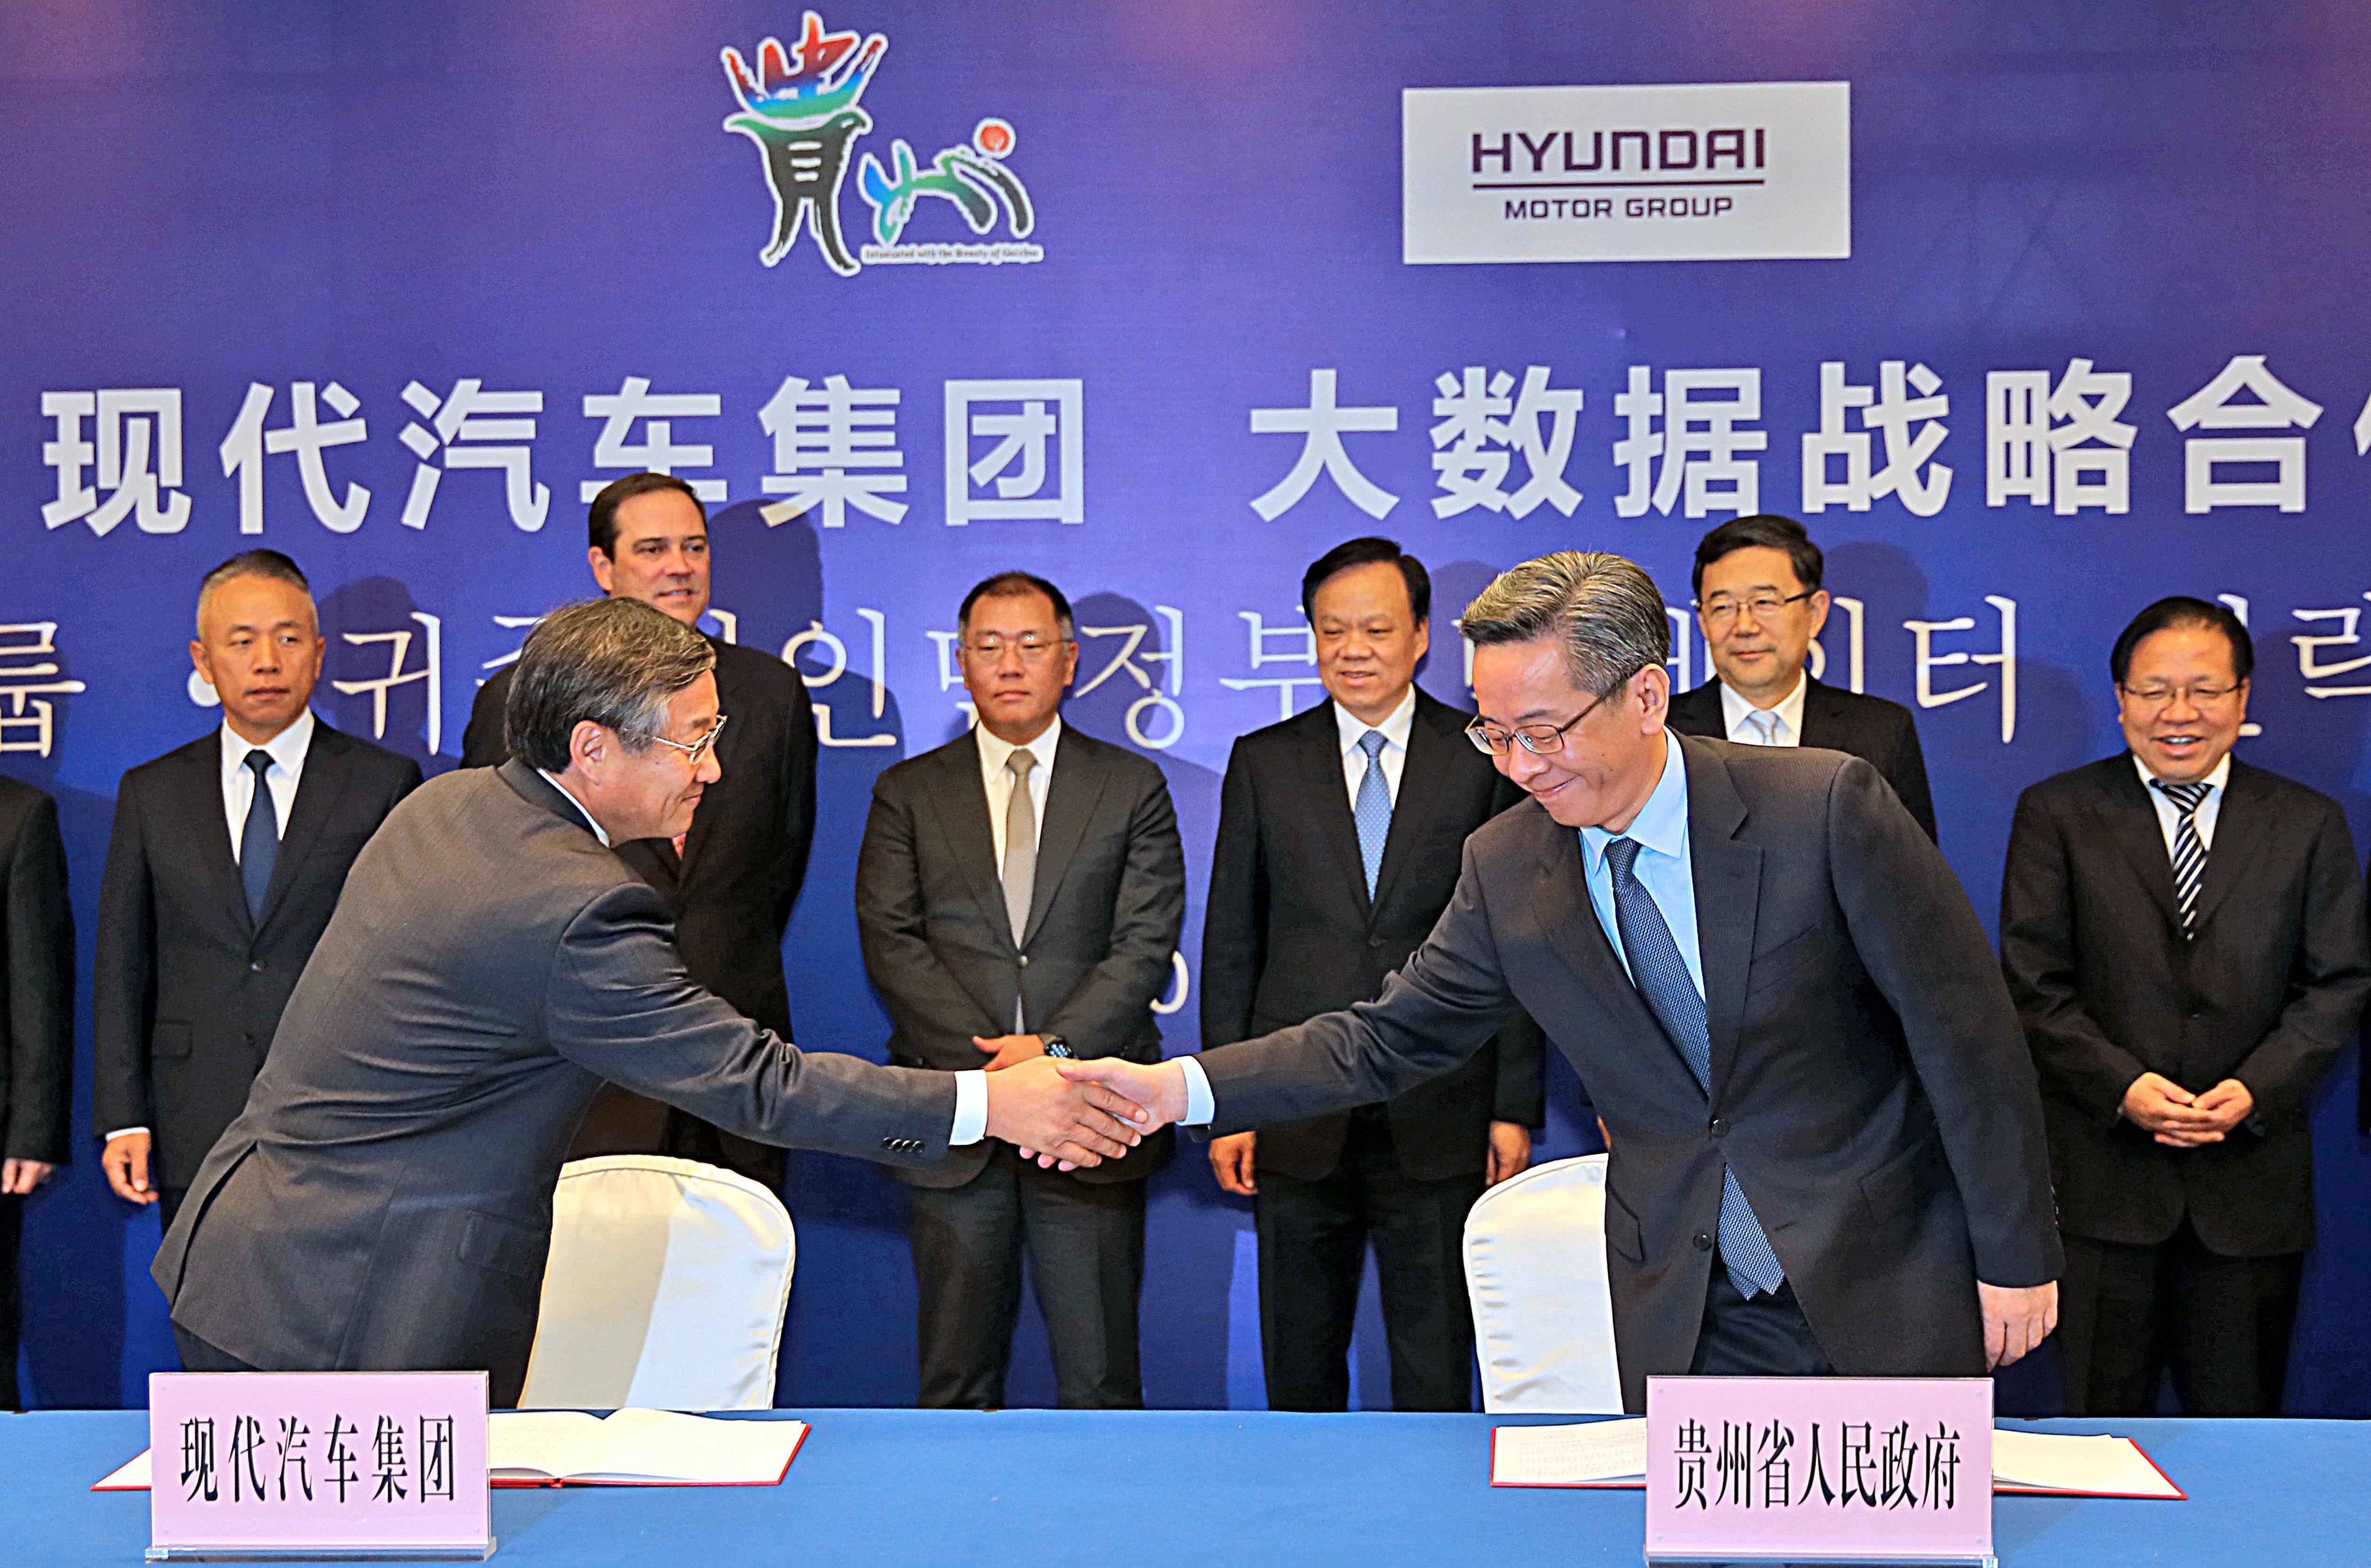 Hyundai China Big Data Center_2.jpg